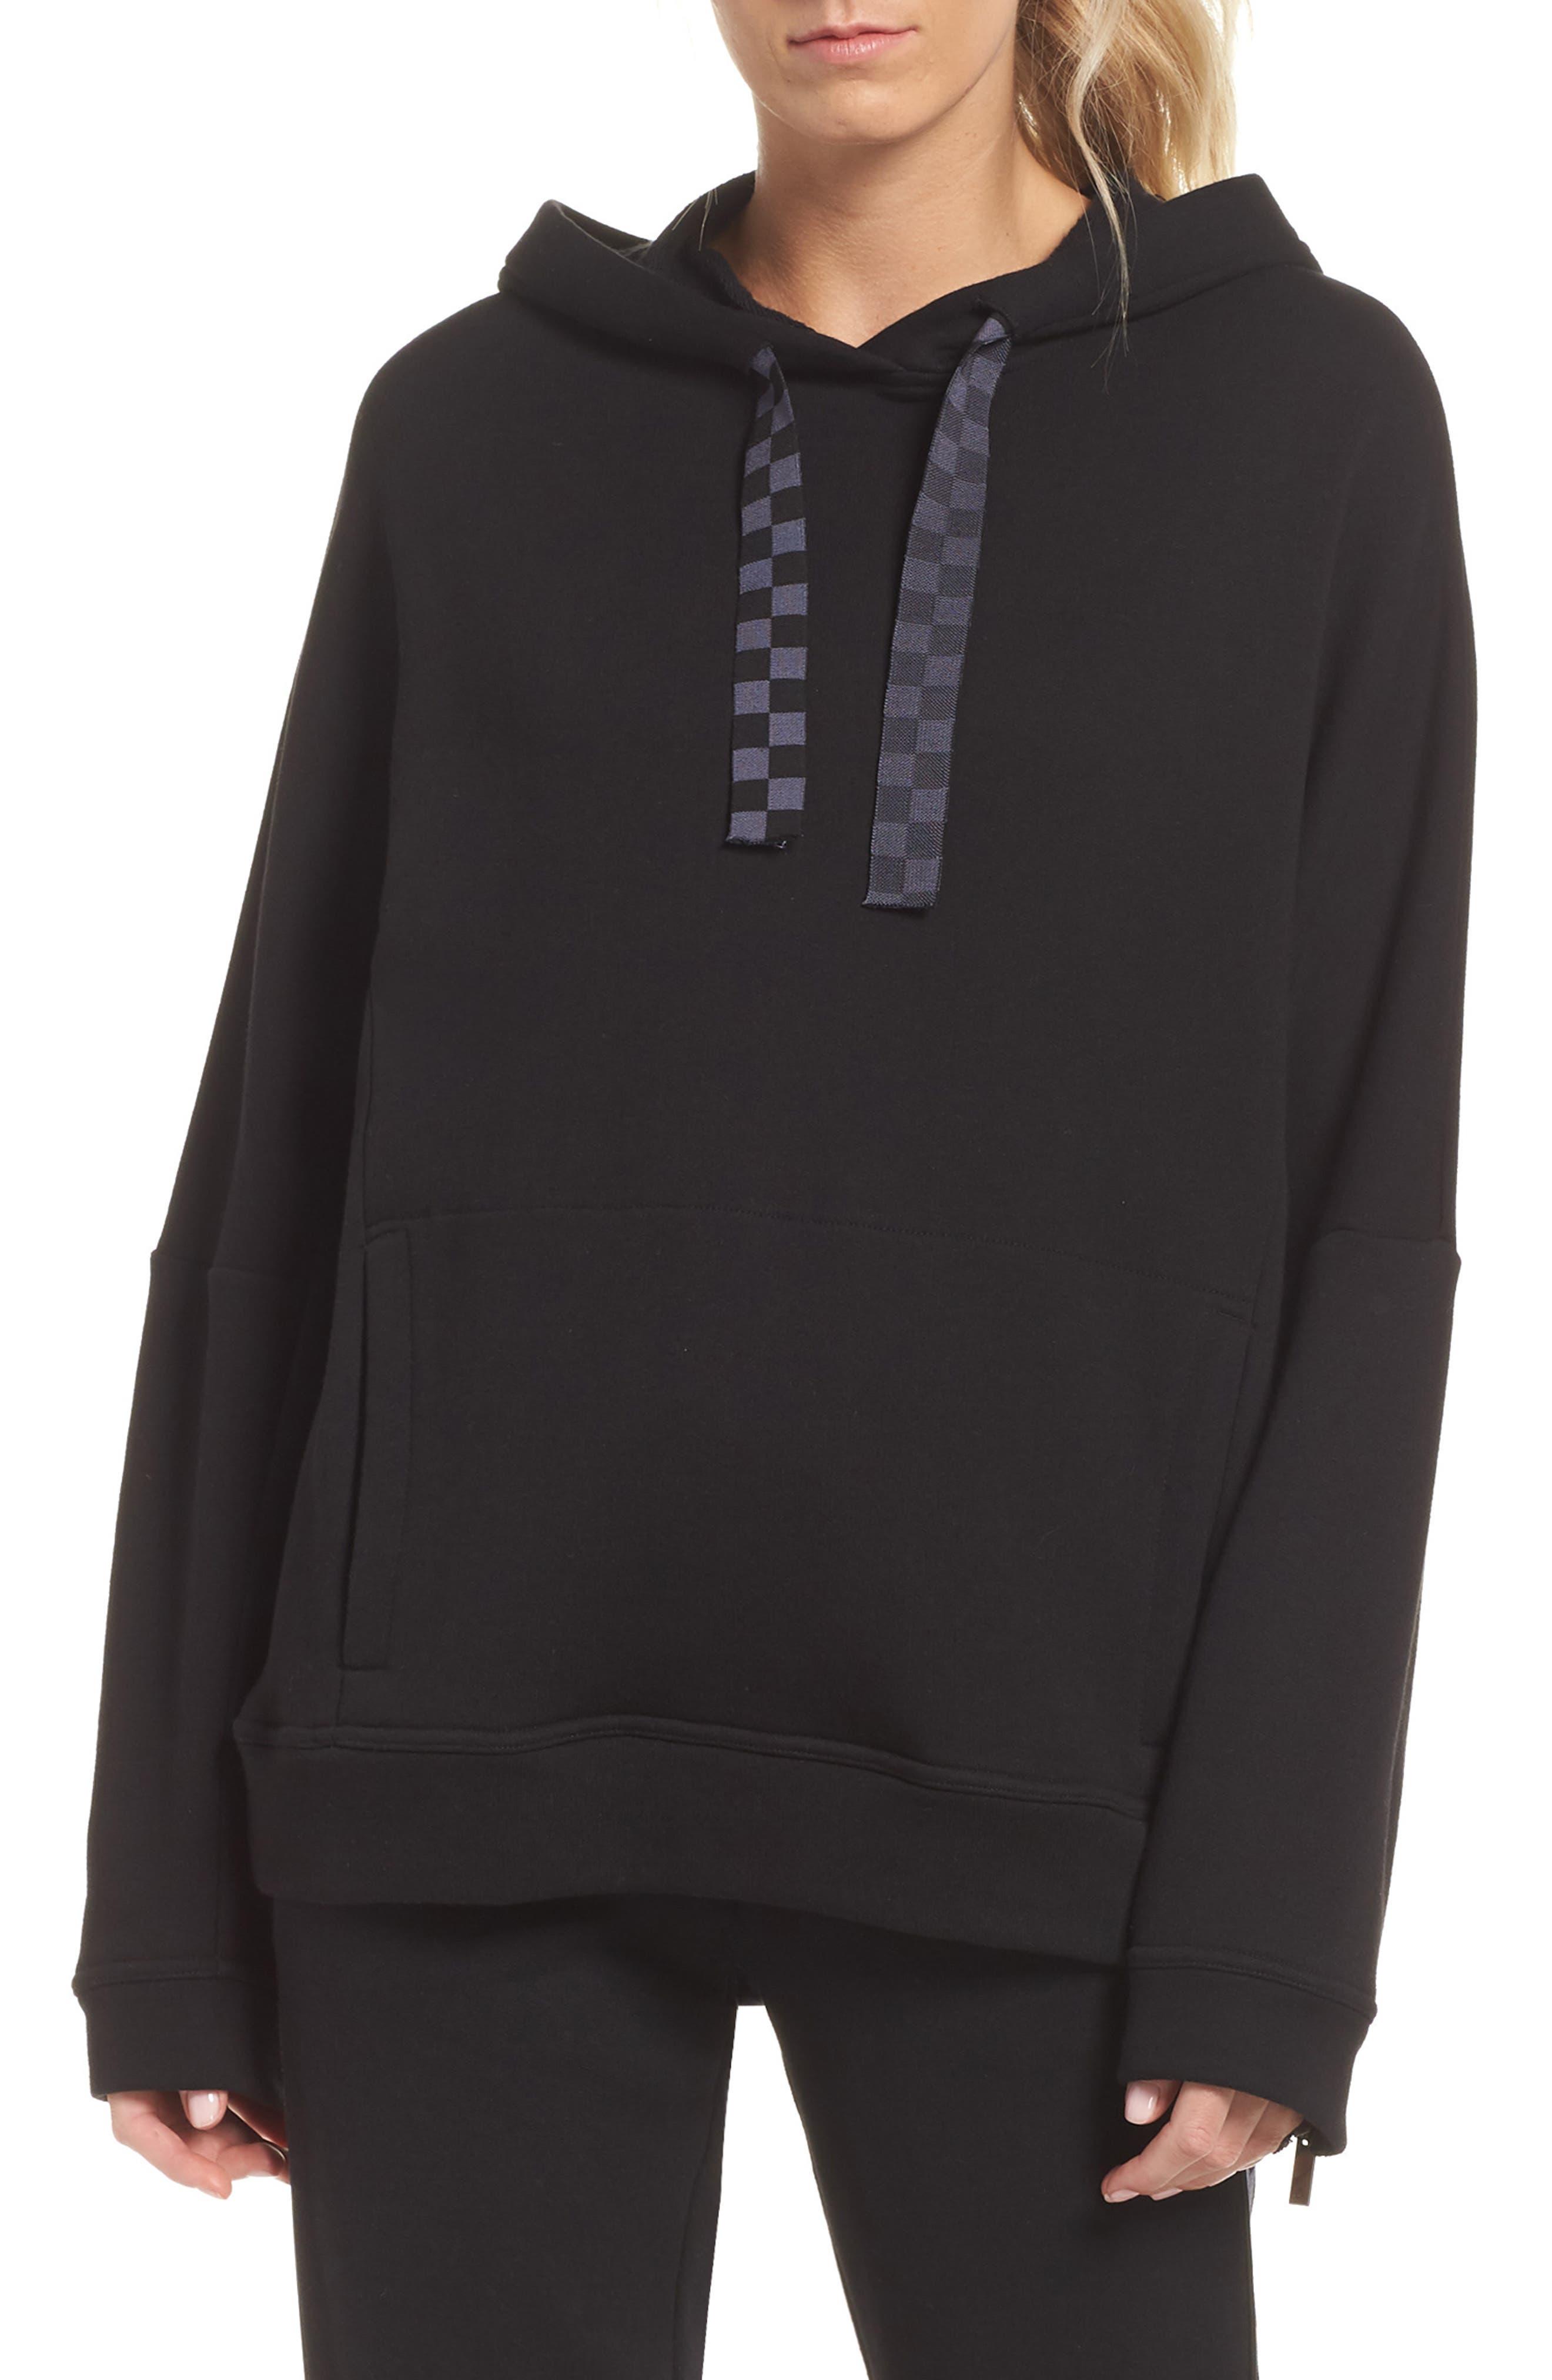 Shift Hoodie Sweatshirt,                             Main thumbnail 1, color,                             BLACK/ CHECKER